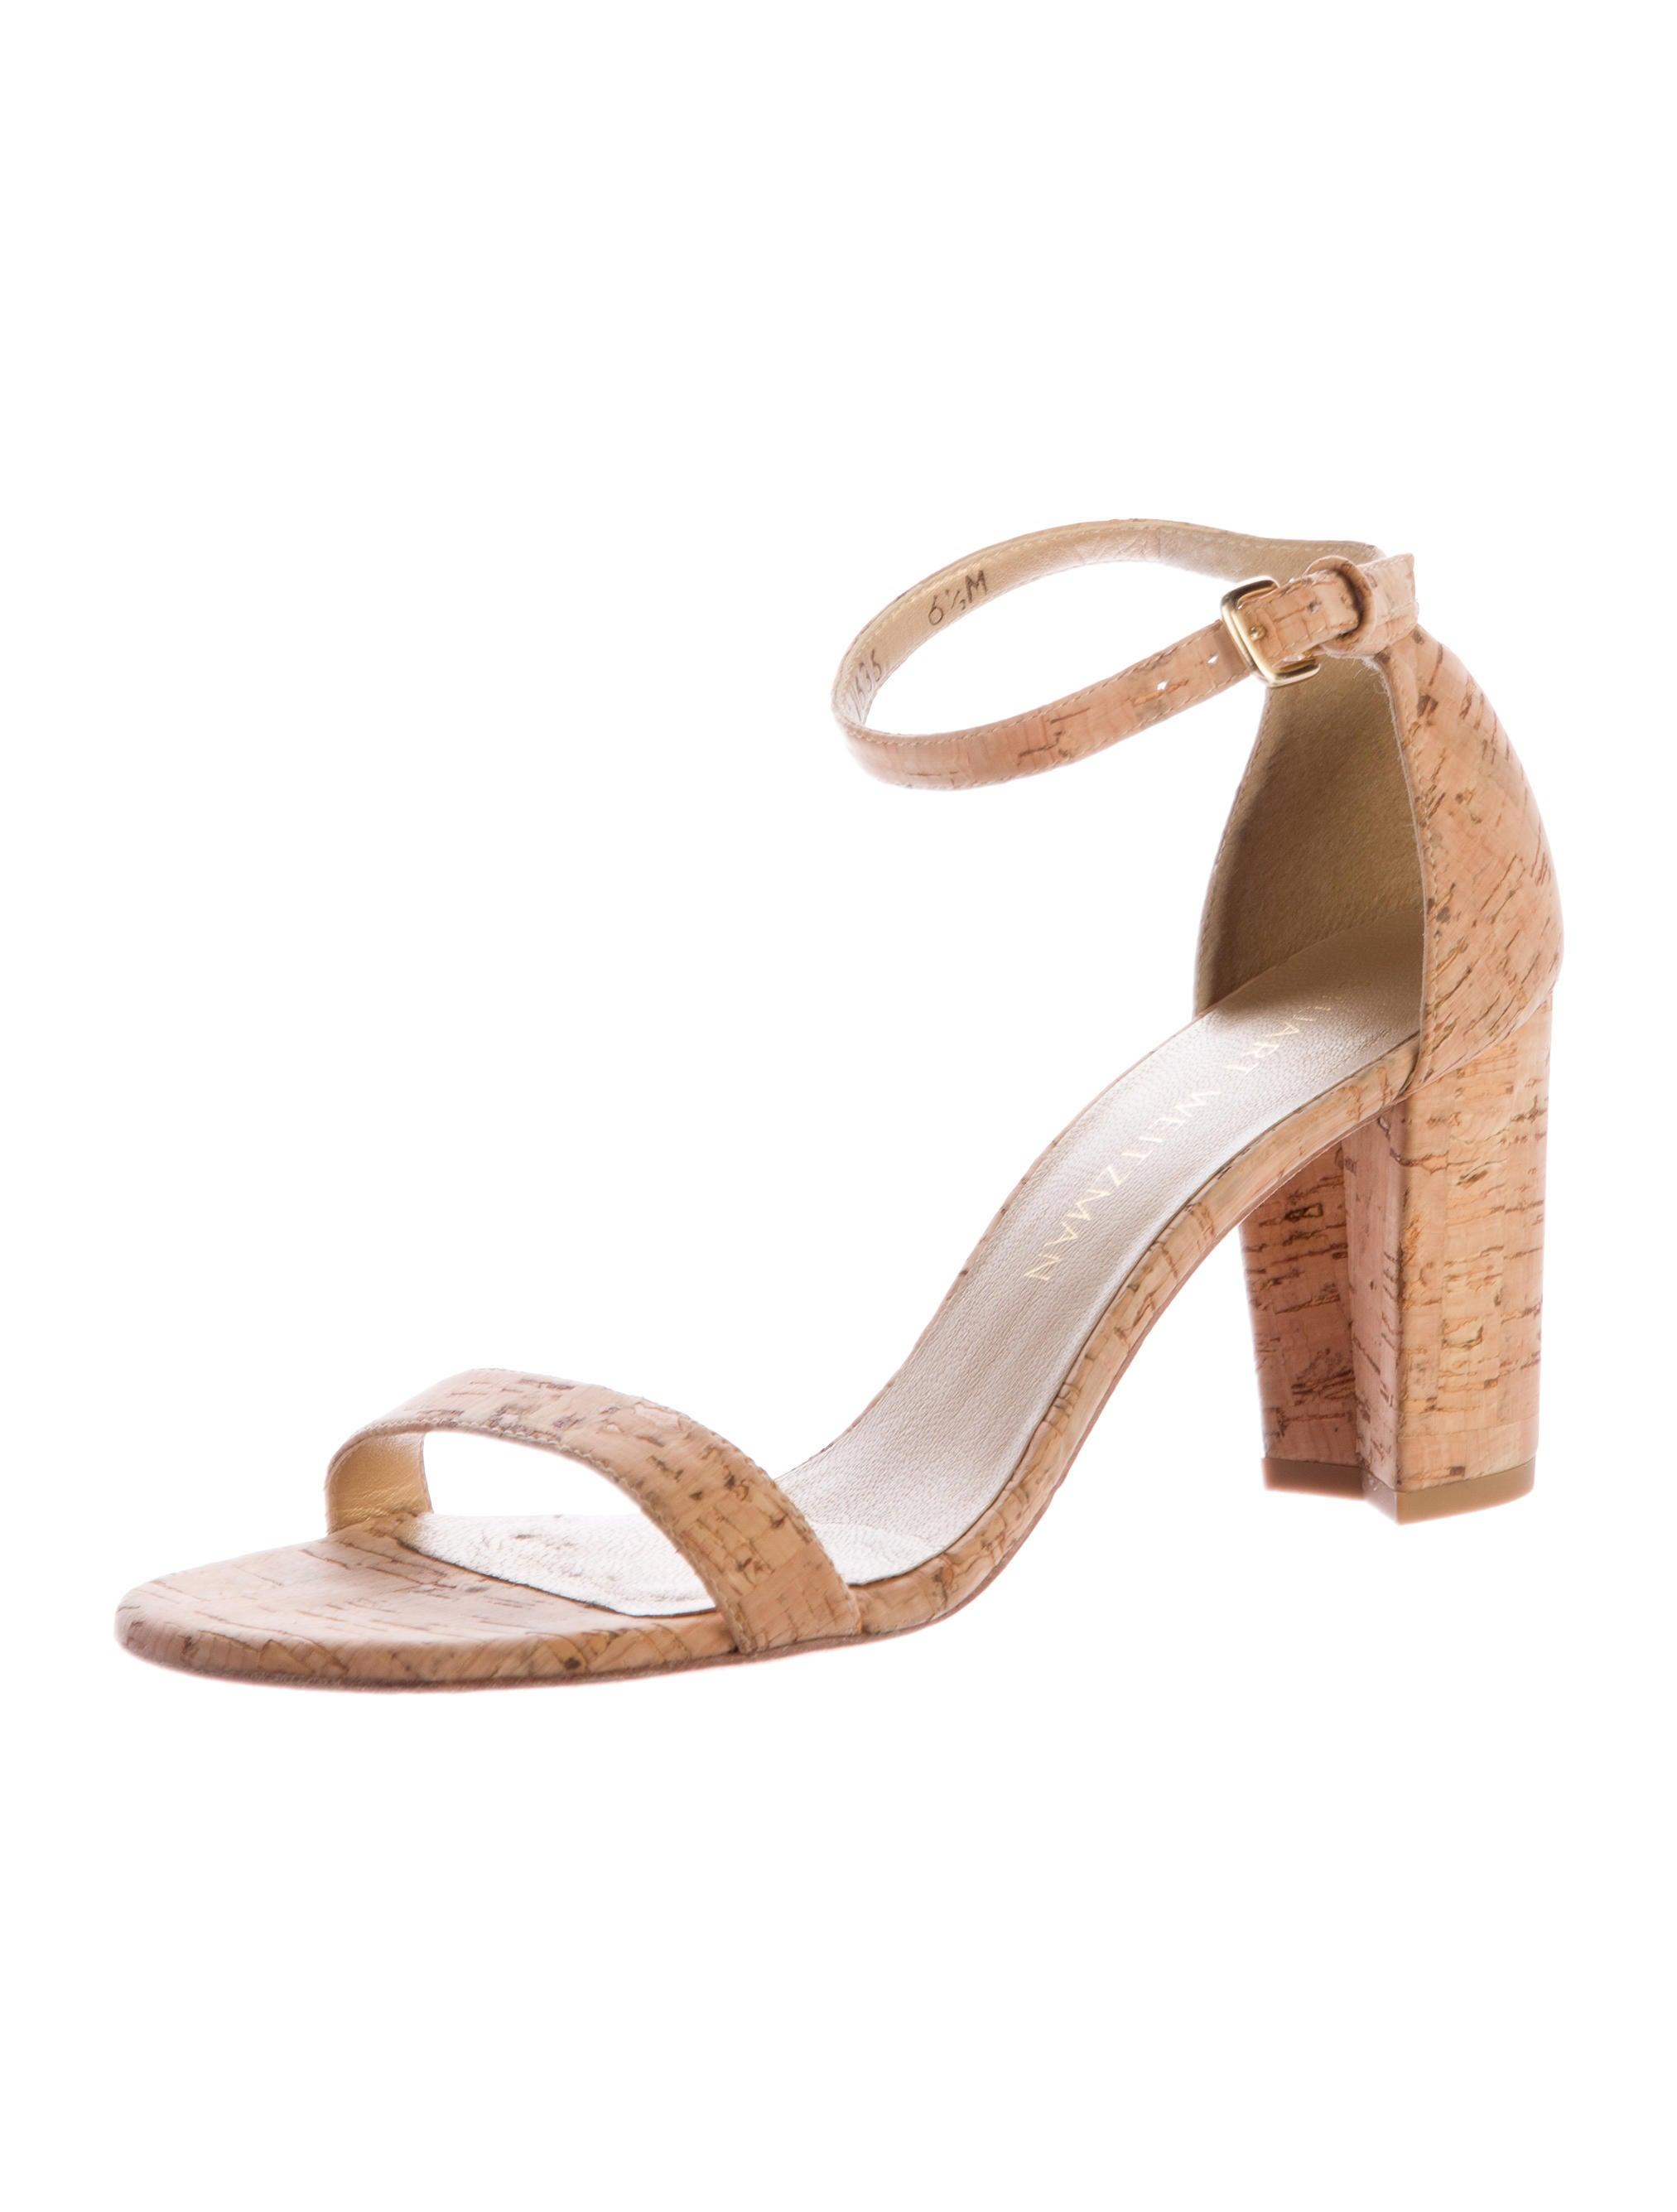 Stuart Weitzman Nearlynude Cork Sandals Shoes Wsu26614